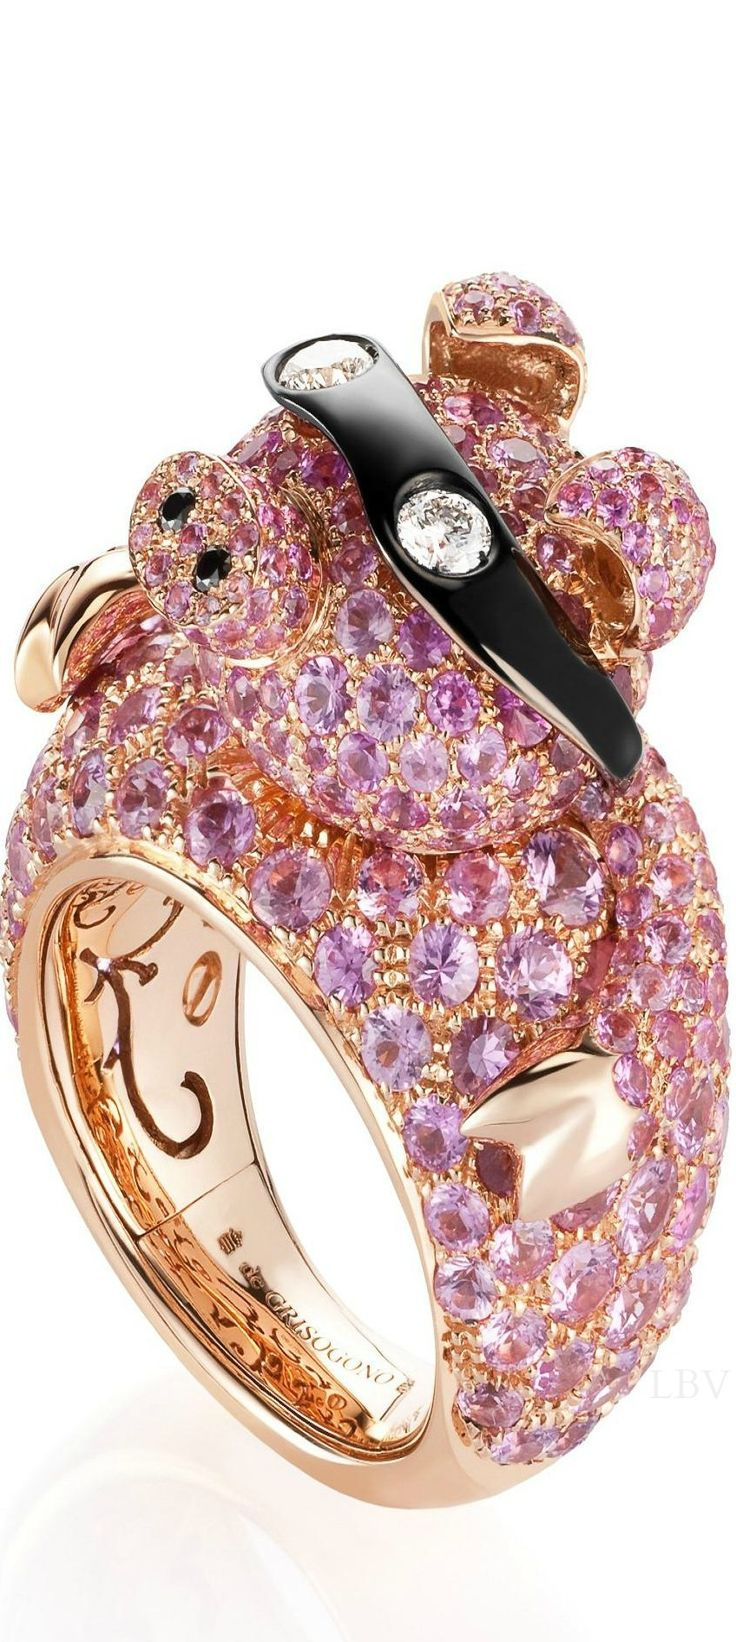 383 best Jewelry Designs I LOVE images on Pinterest   Jewel, Animal ...